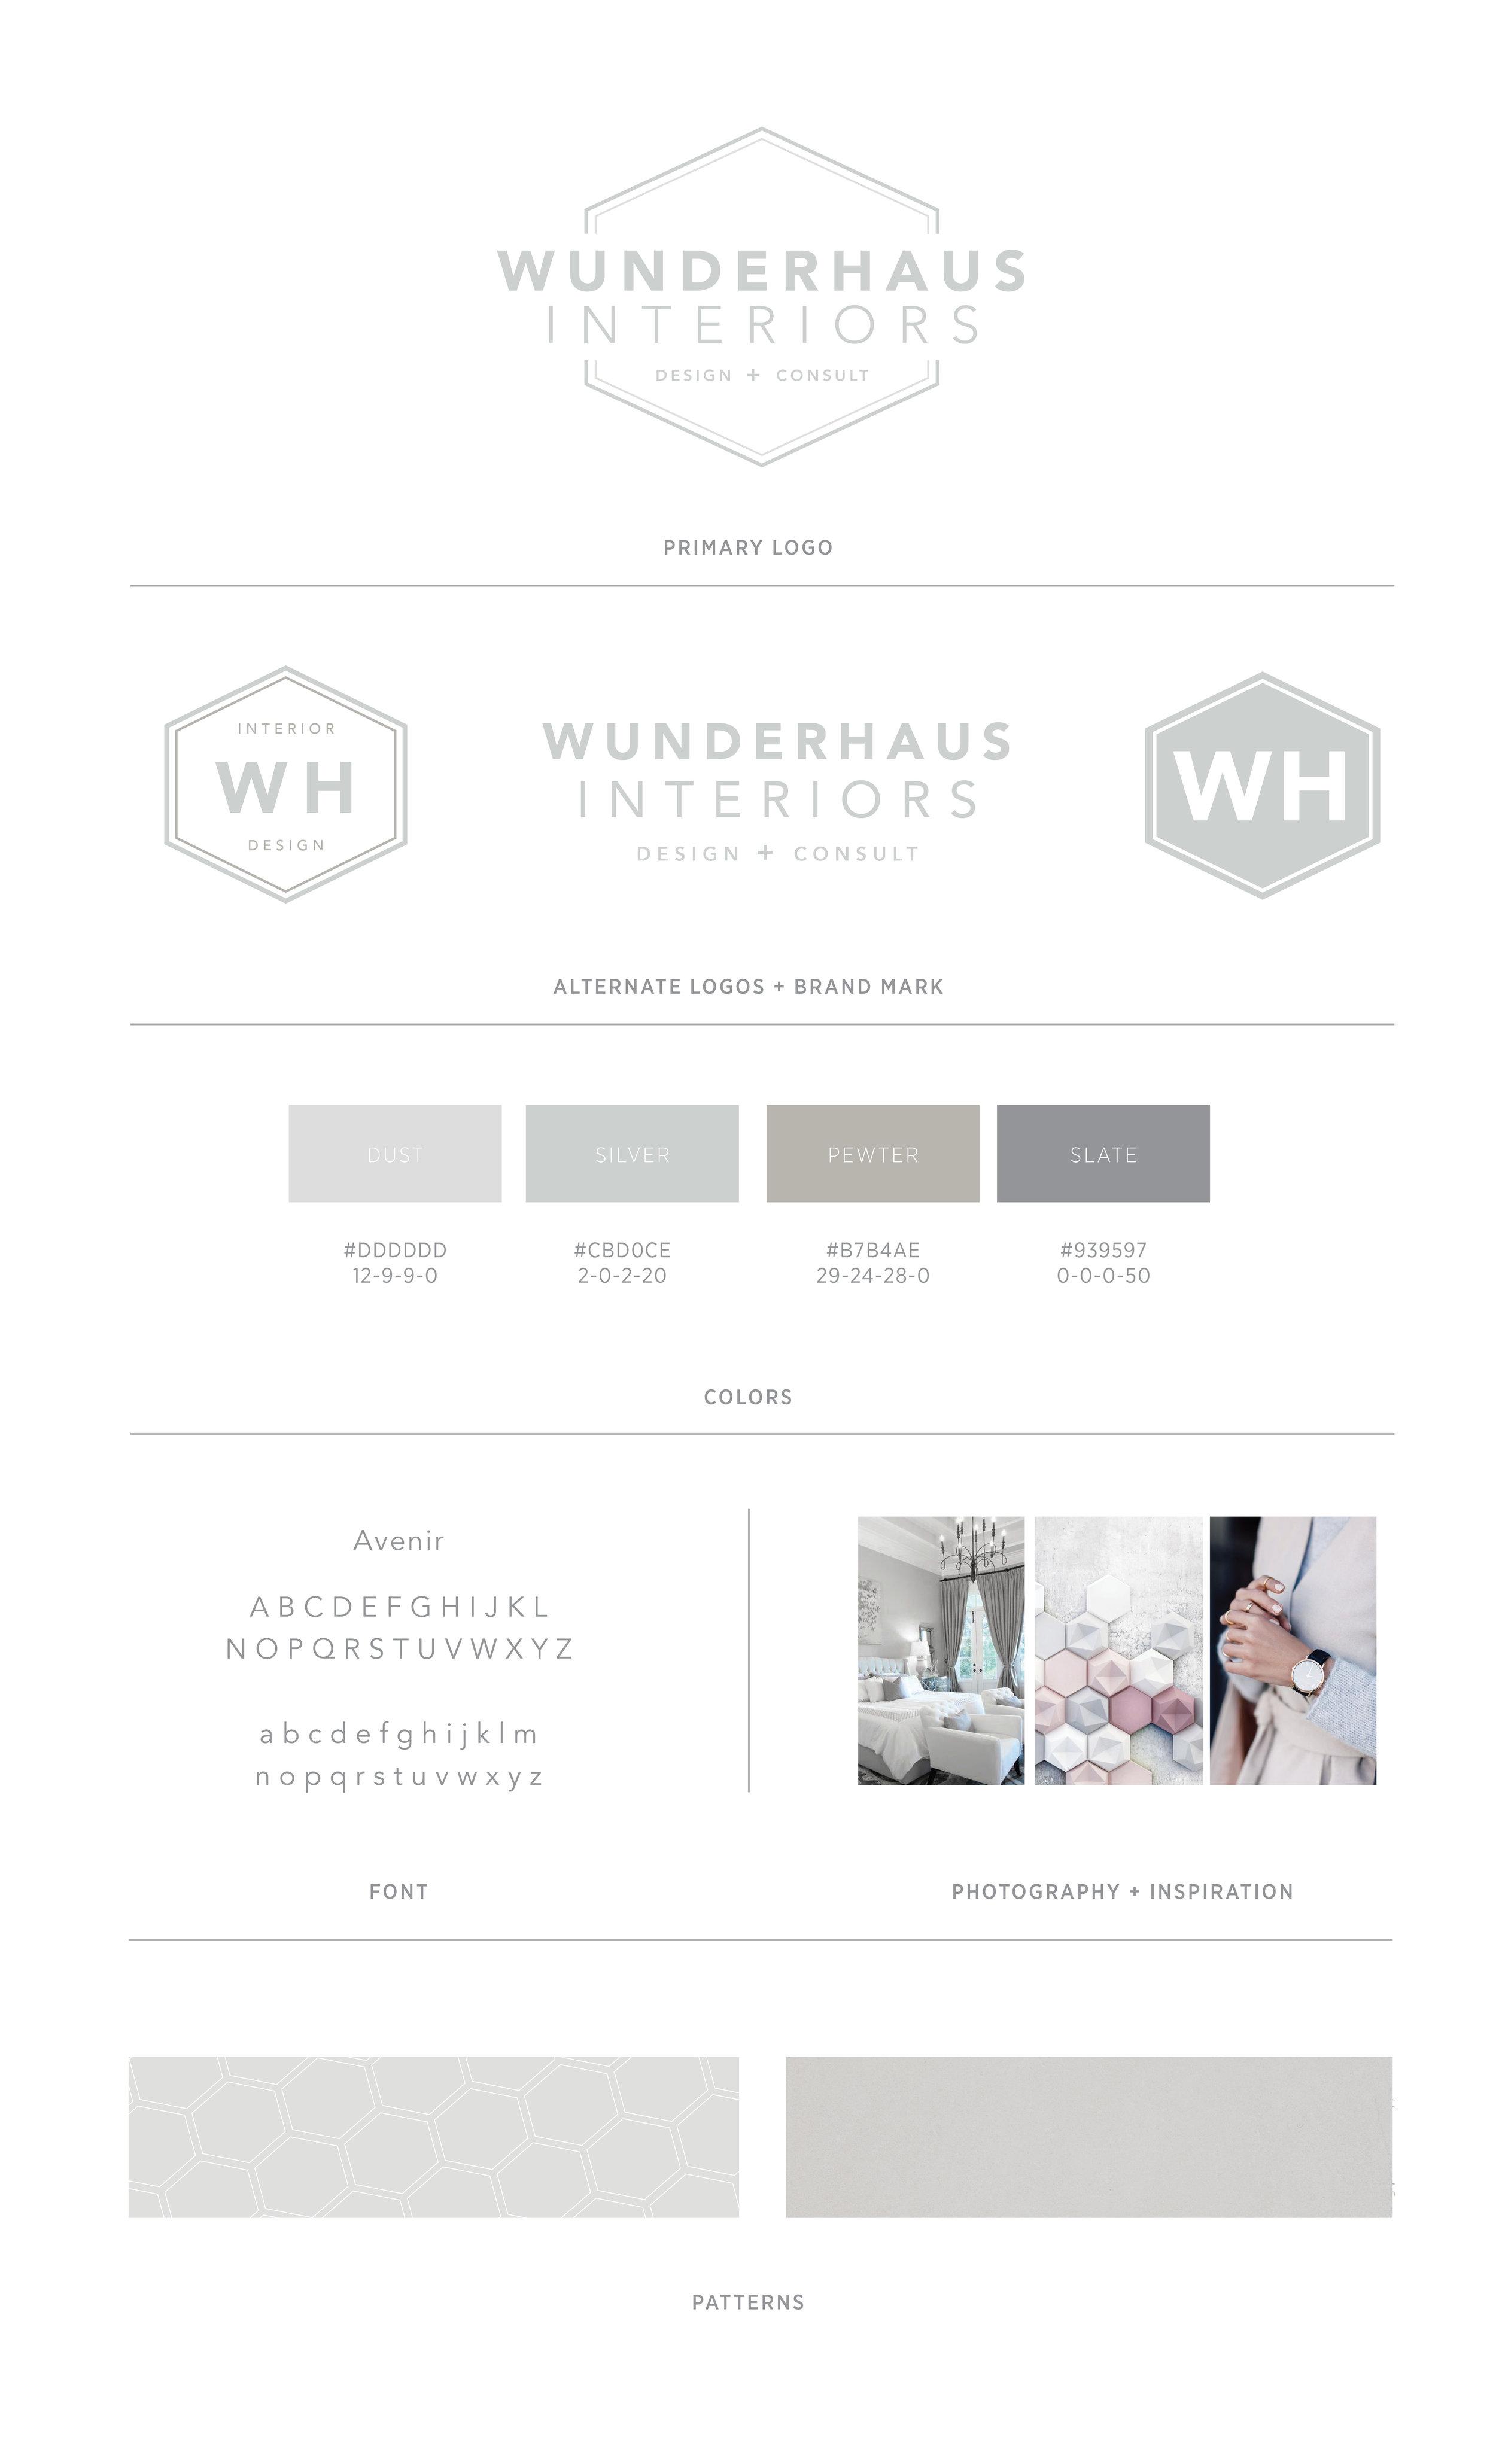 Branding design for Wunderhaus Interiors   casilong.com #casilongdesign #fearlesspursuit #branding #branddesign